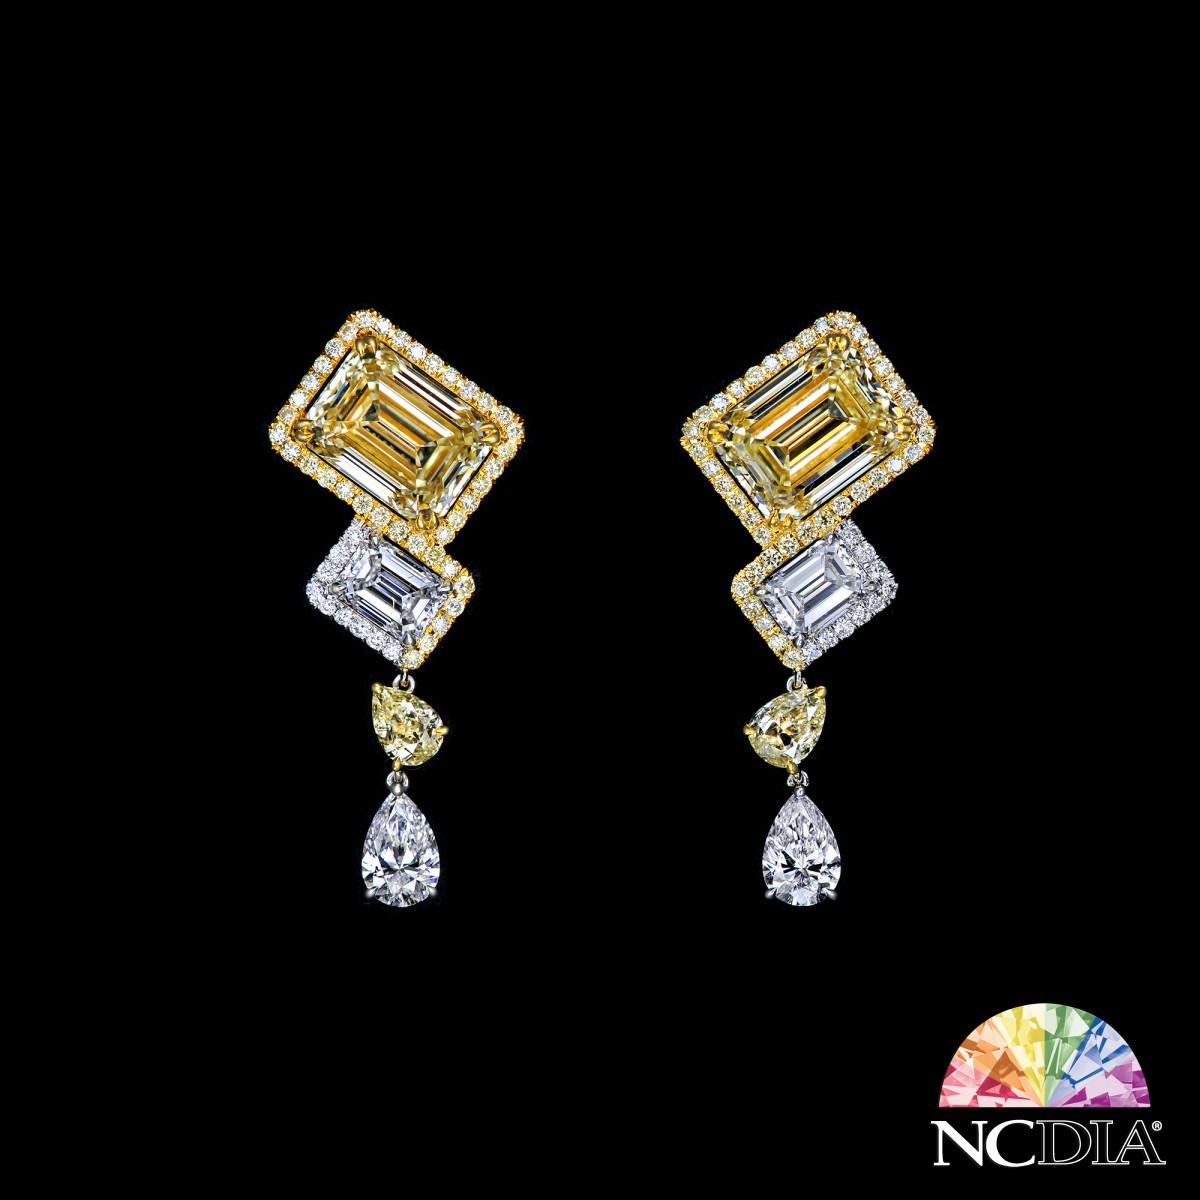 Over 5 cts ea Emerald Cut Fancy Light Yellow Diamond Earrings, GIA reports ava.